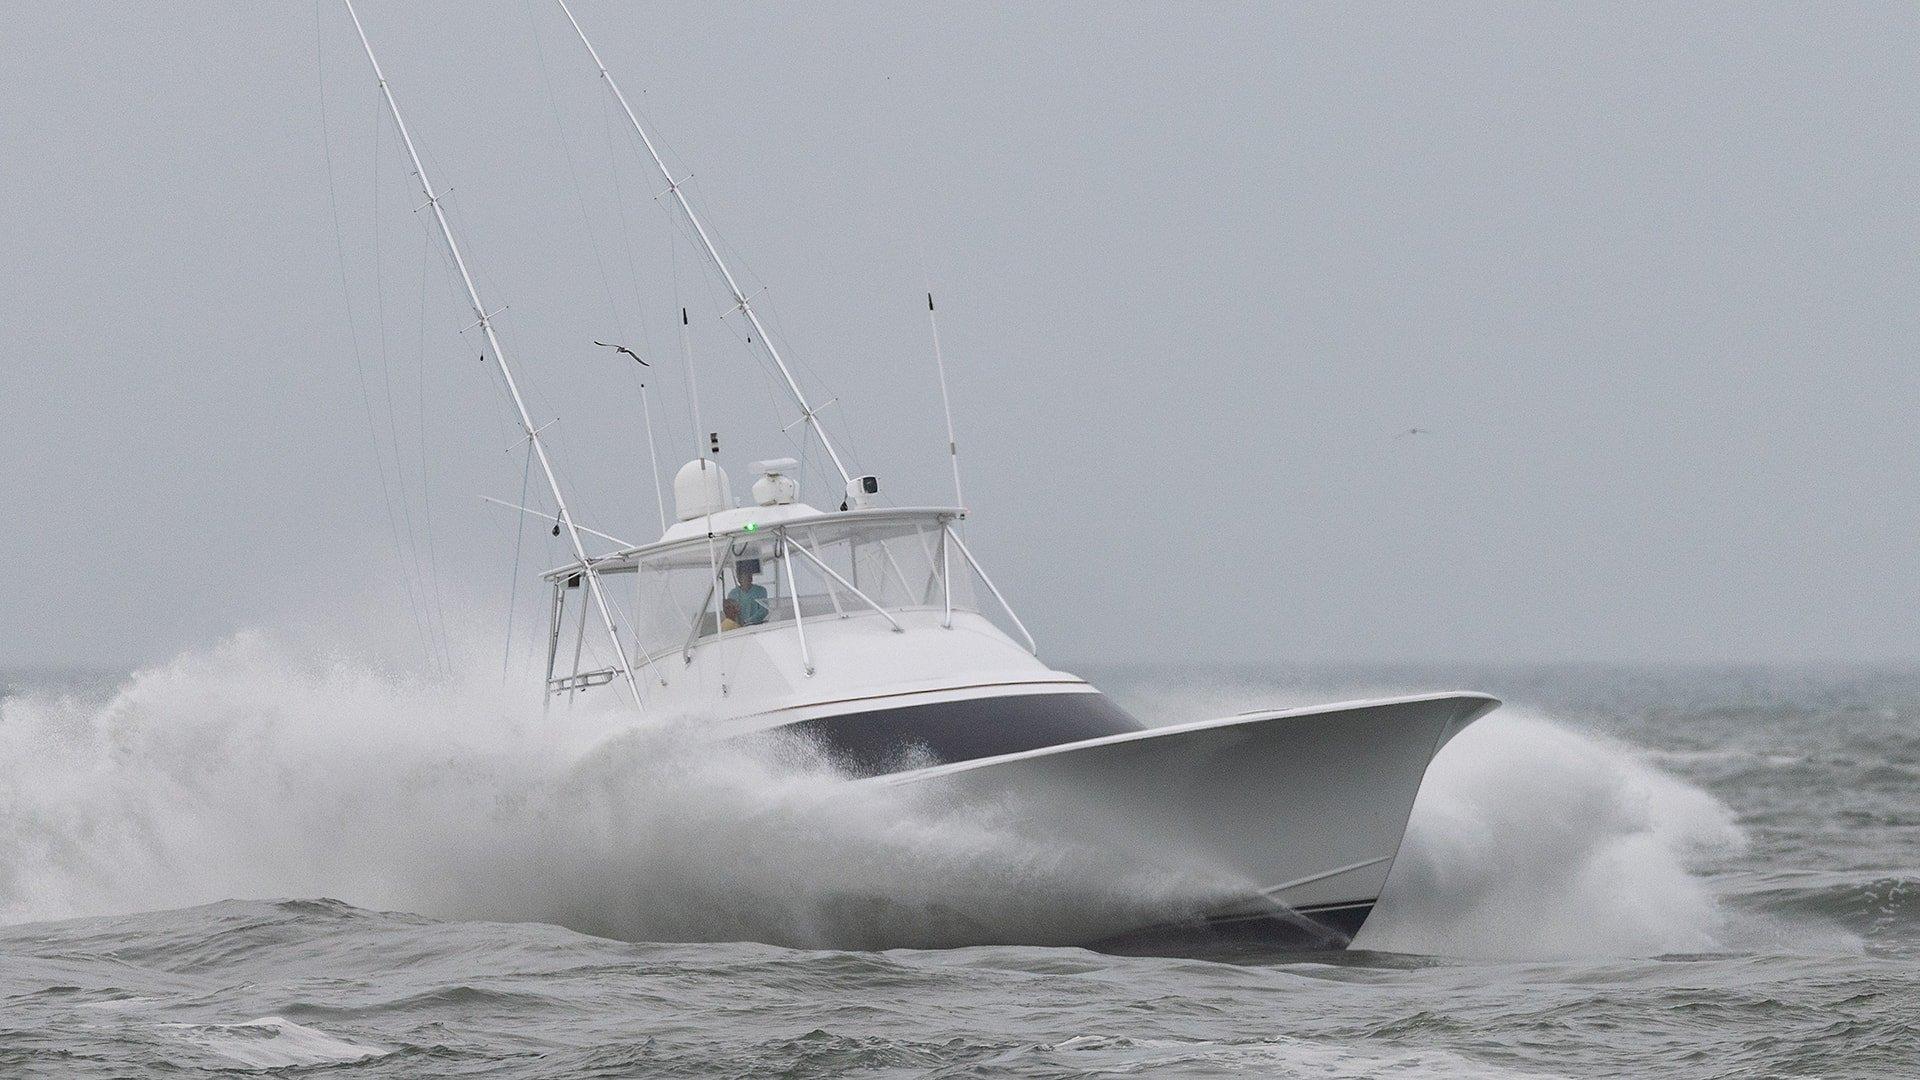 Sportfishing Boat In Ocean City Maryland